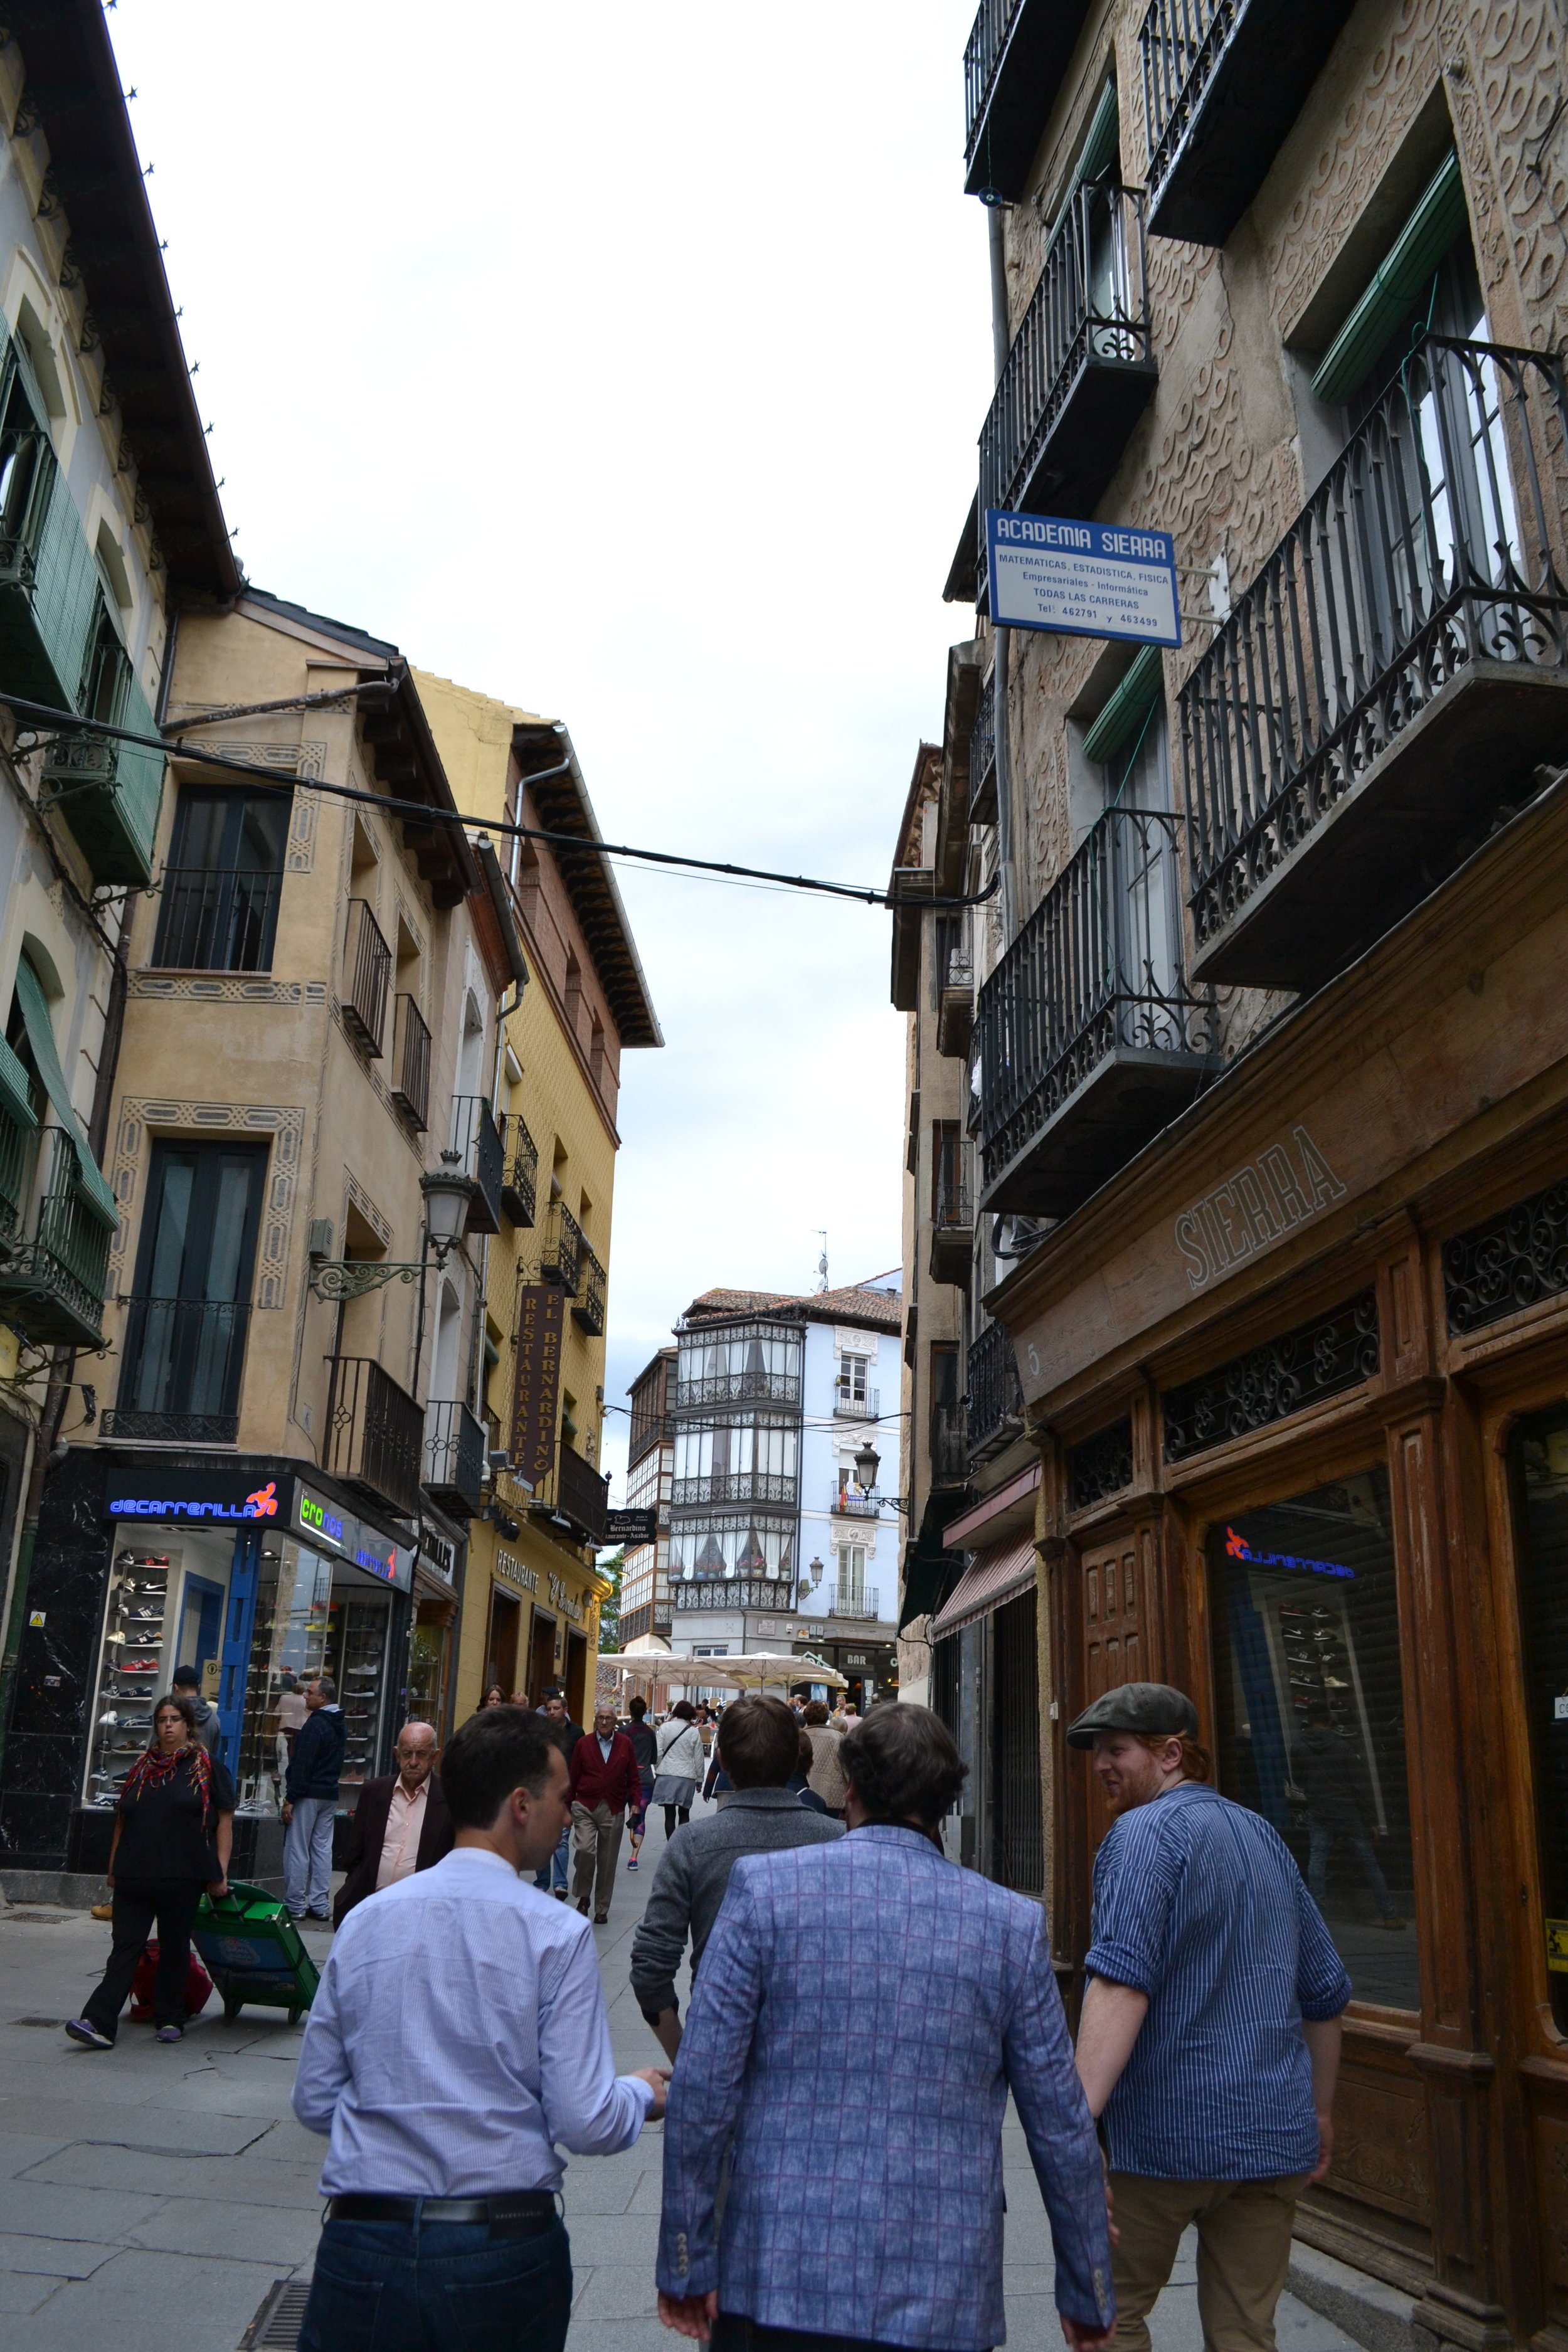 Auf den Straßen Segovias | Sightseeing Segovia